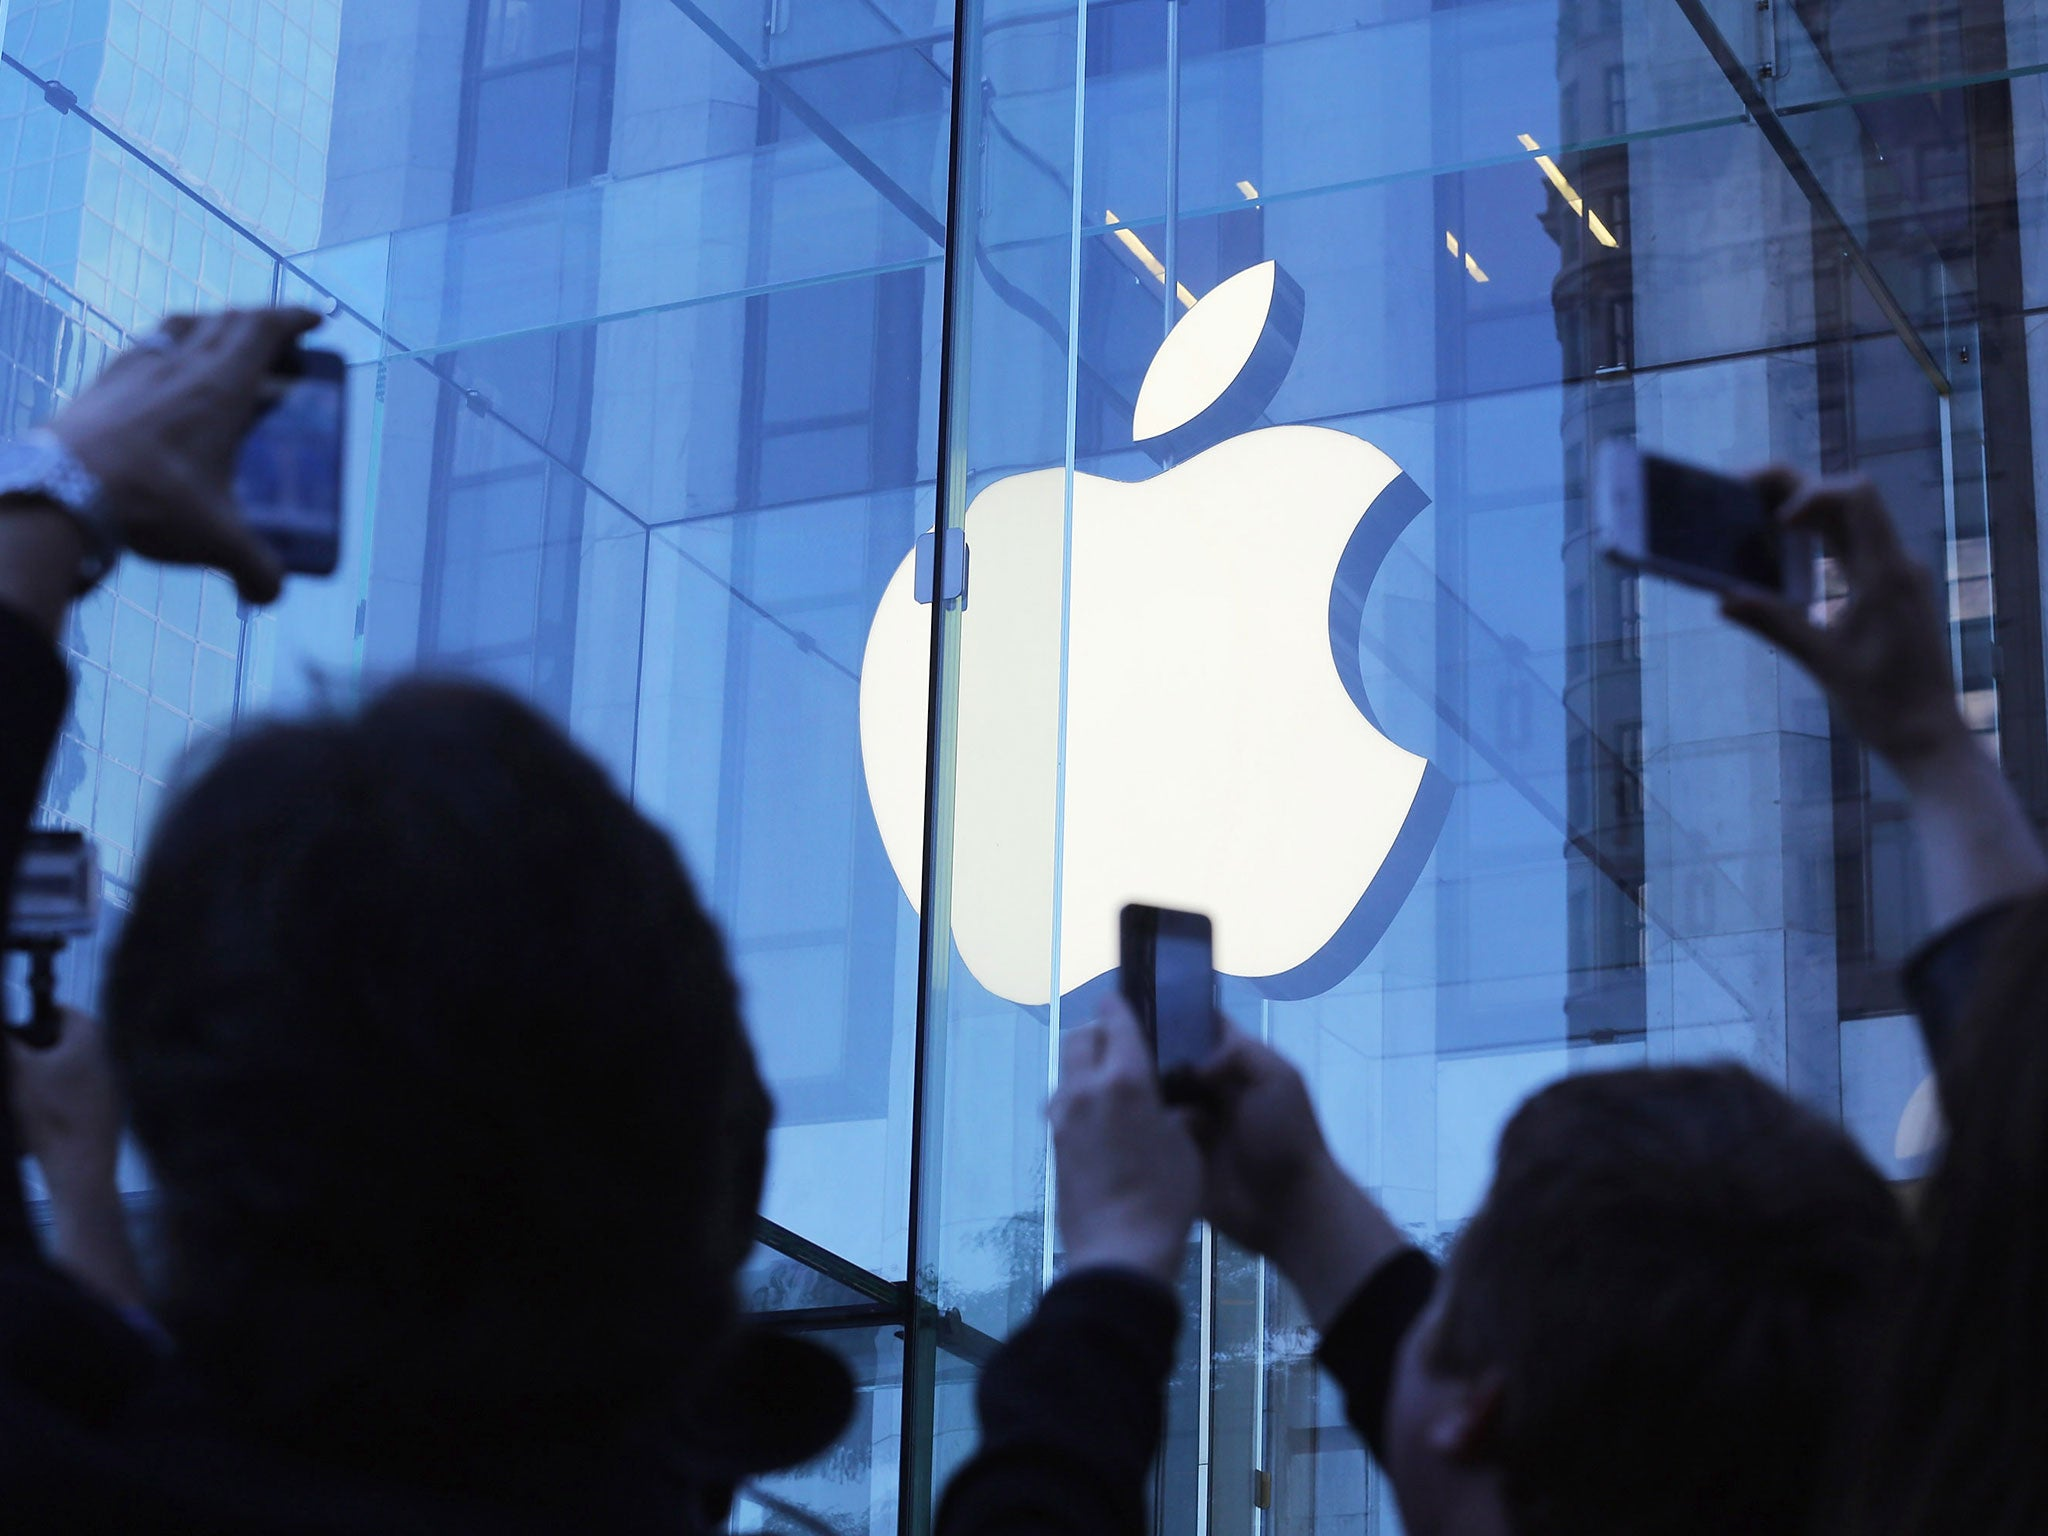 Apple's toughest job interview questions revealed